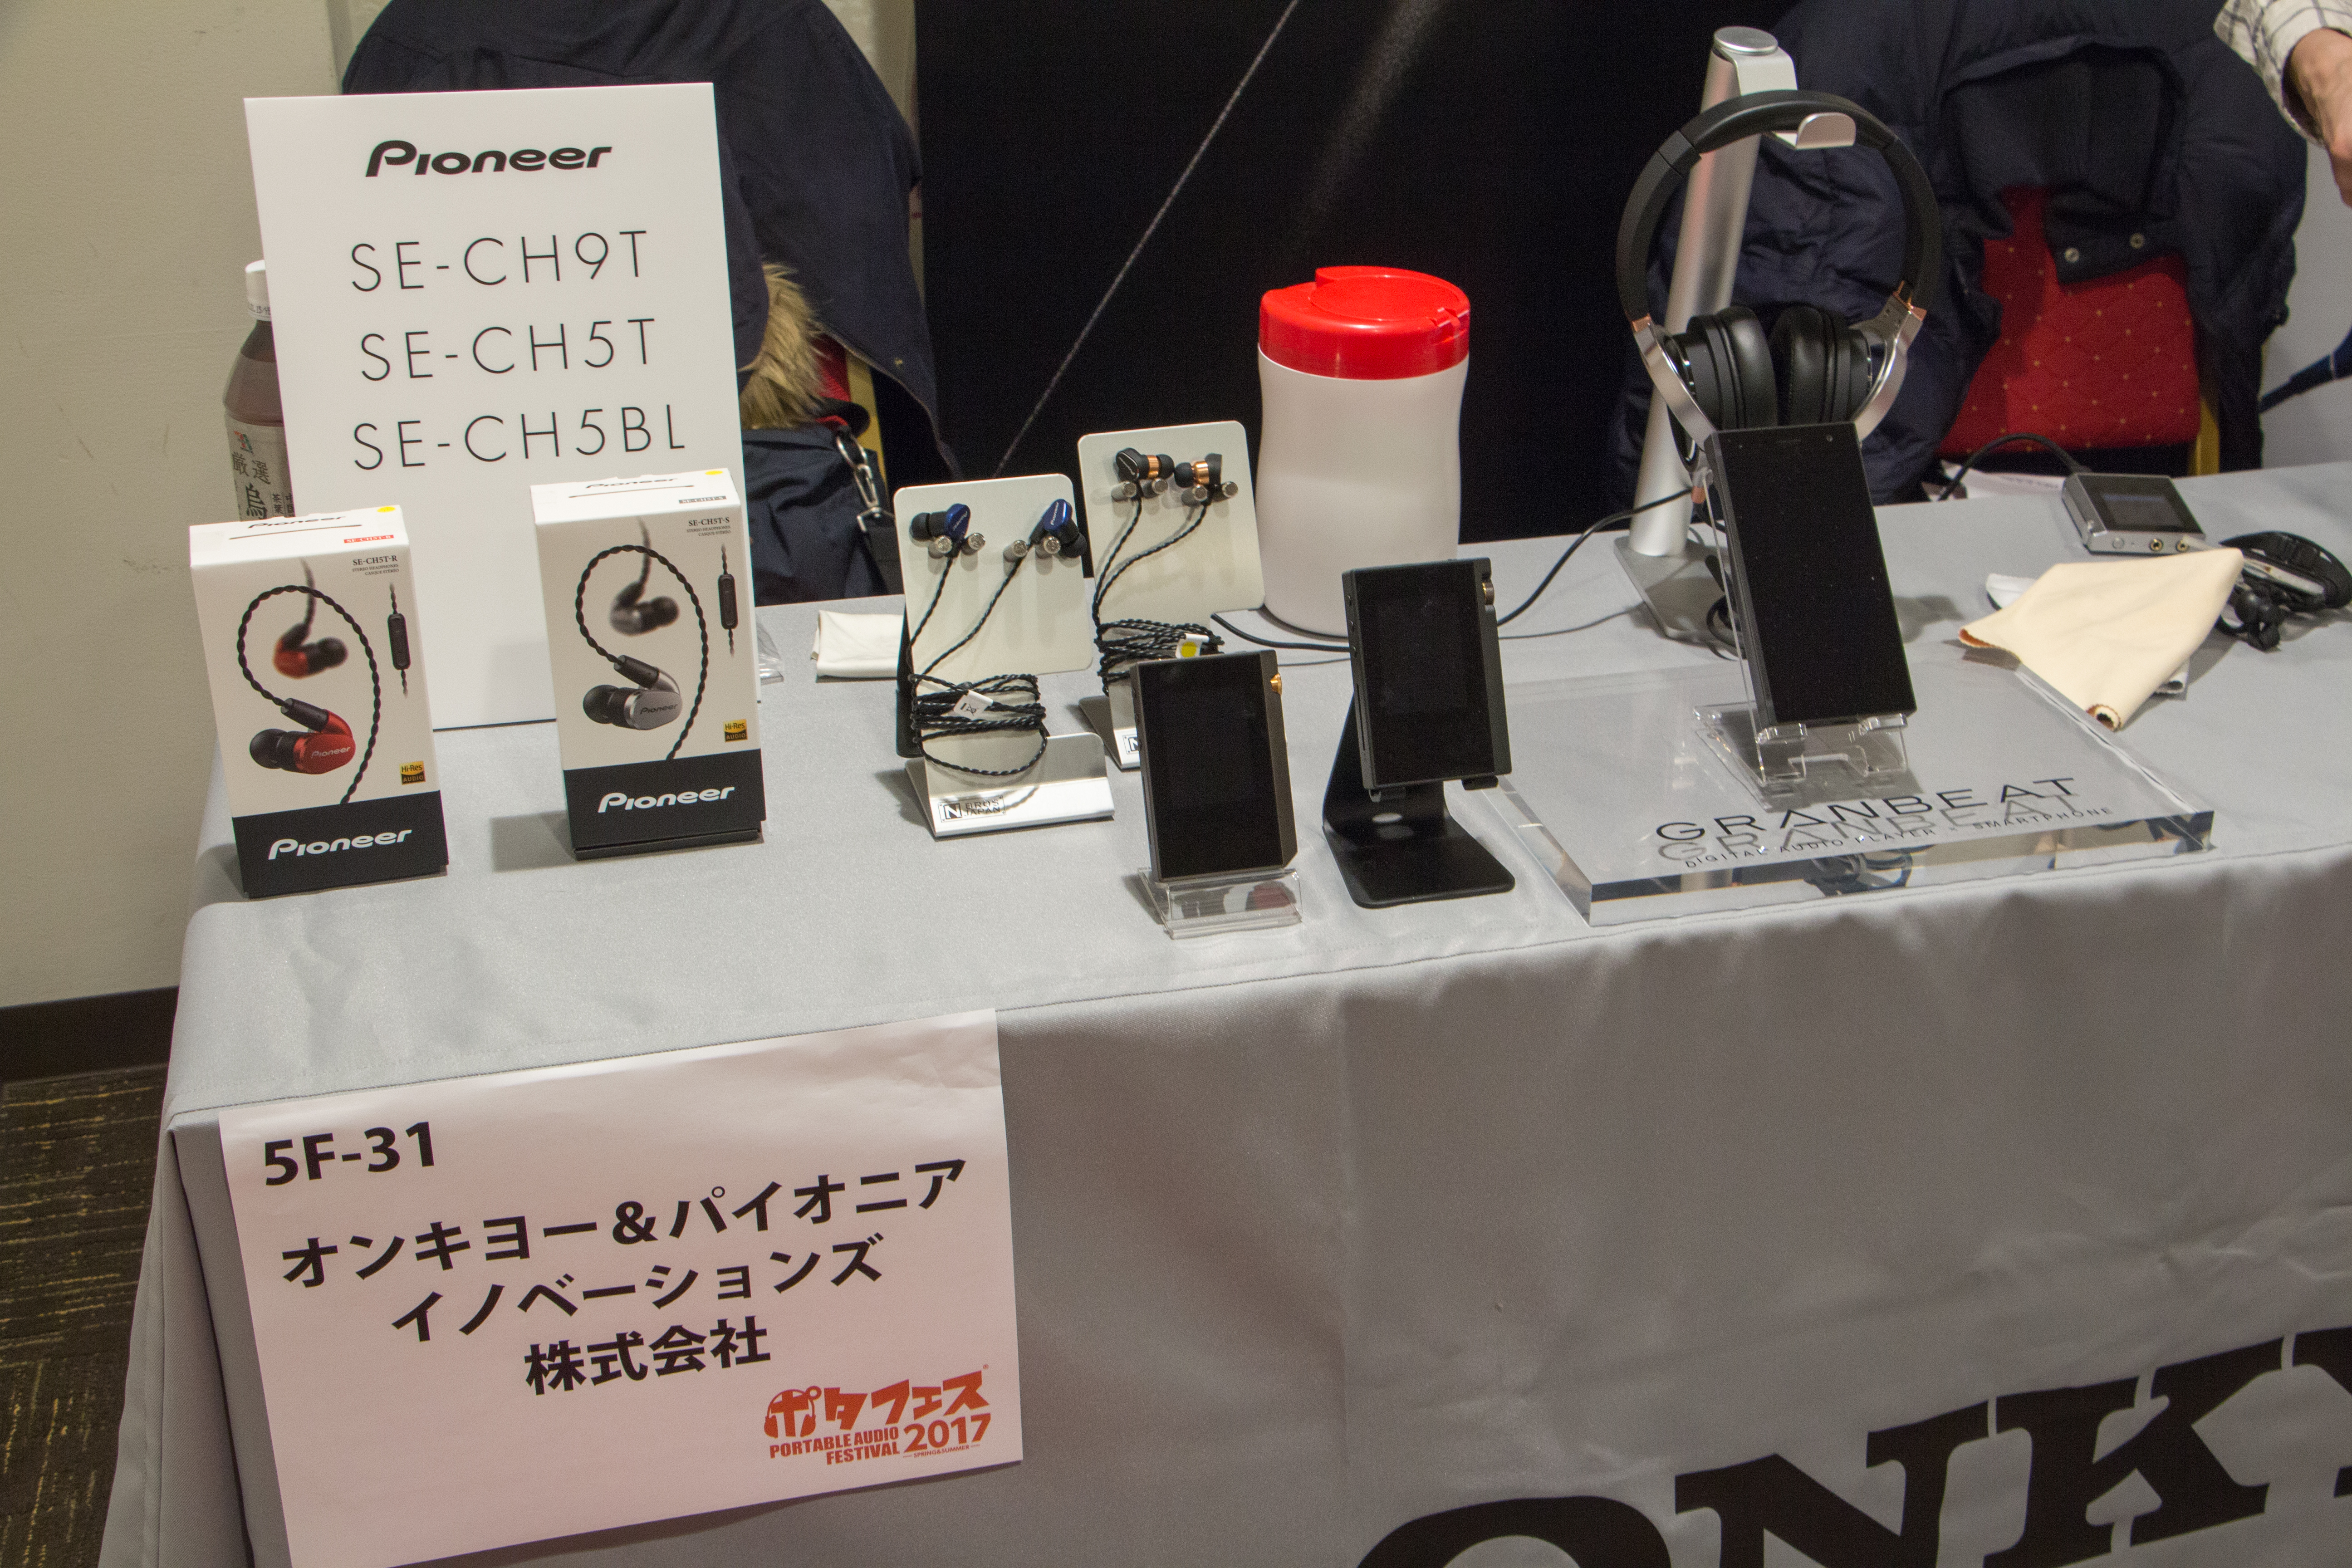 ONKYO & Pioneer(オンキヨー & パイオニア)ブース